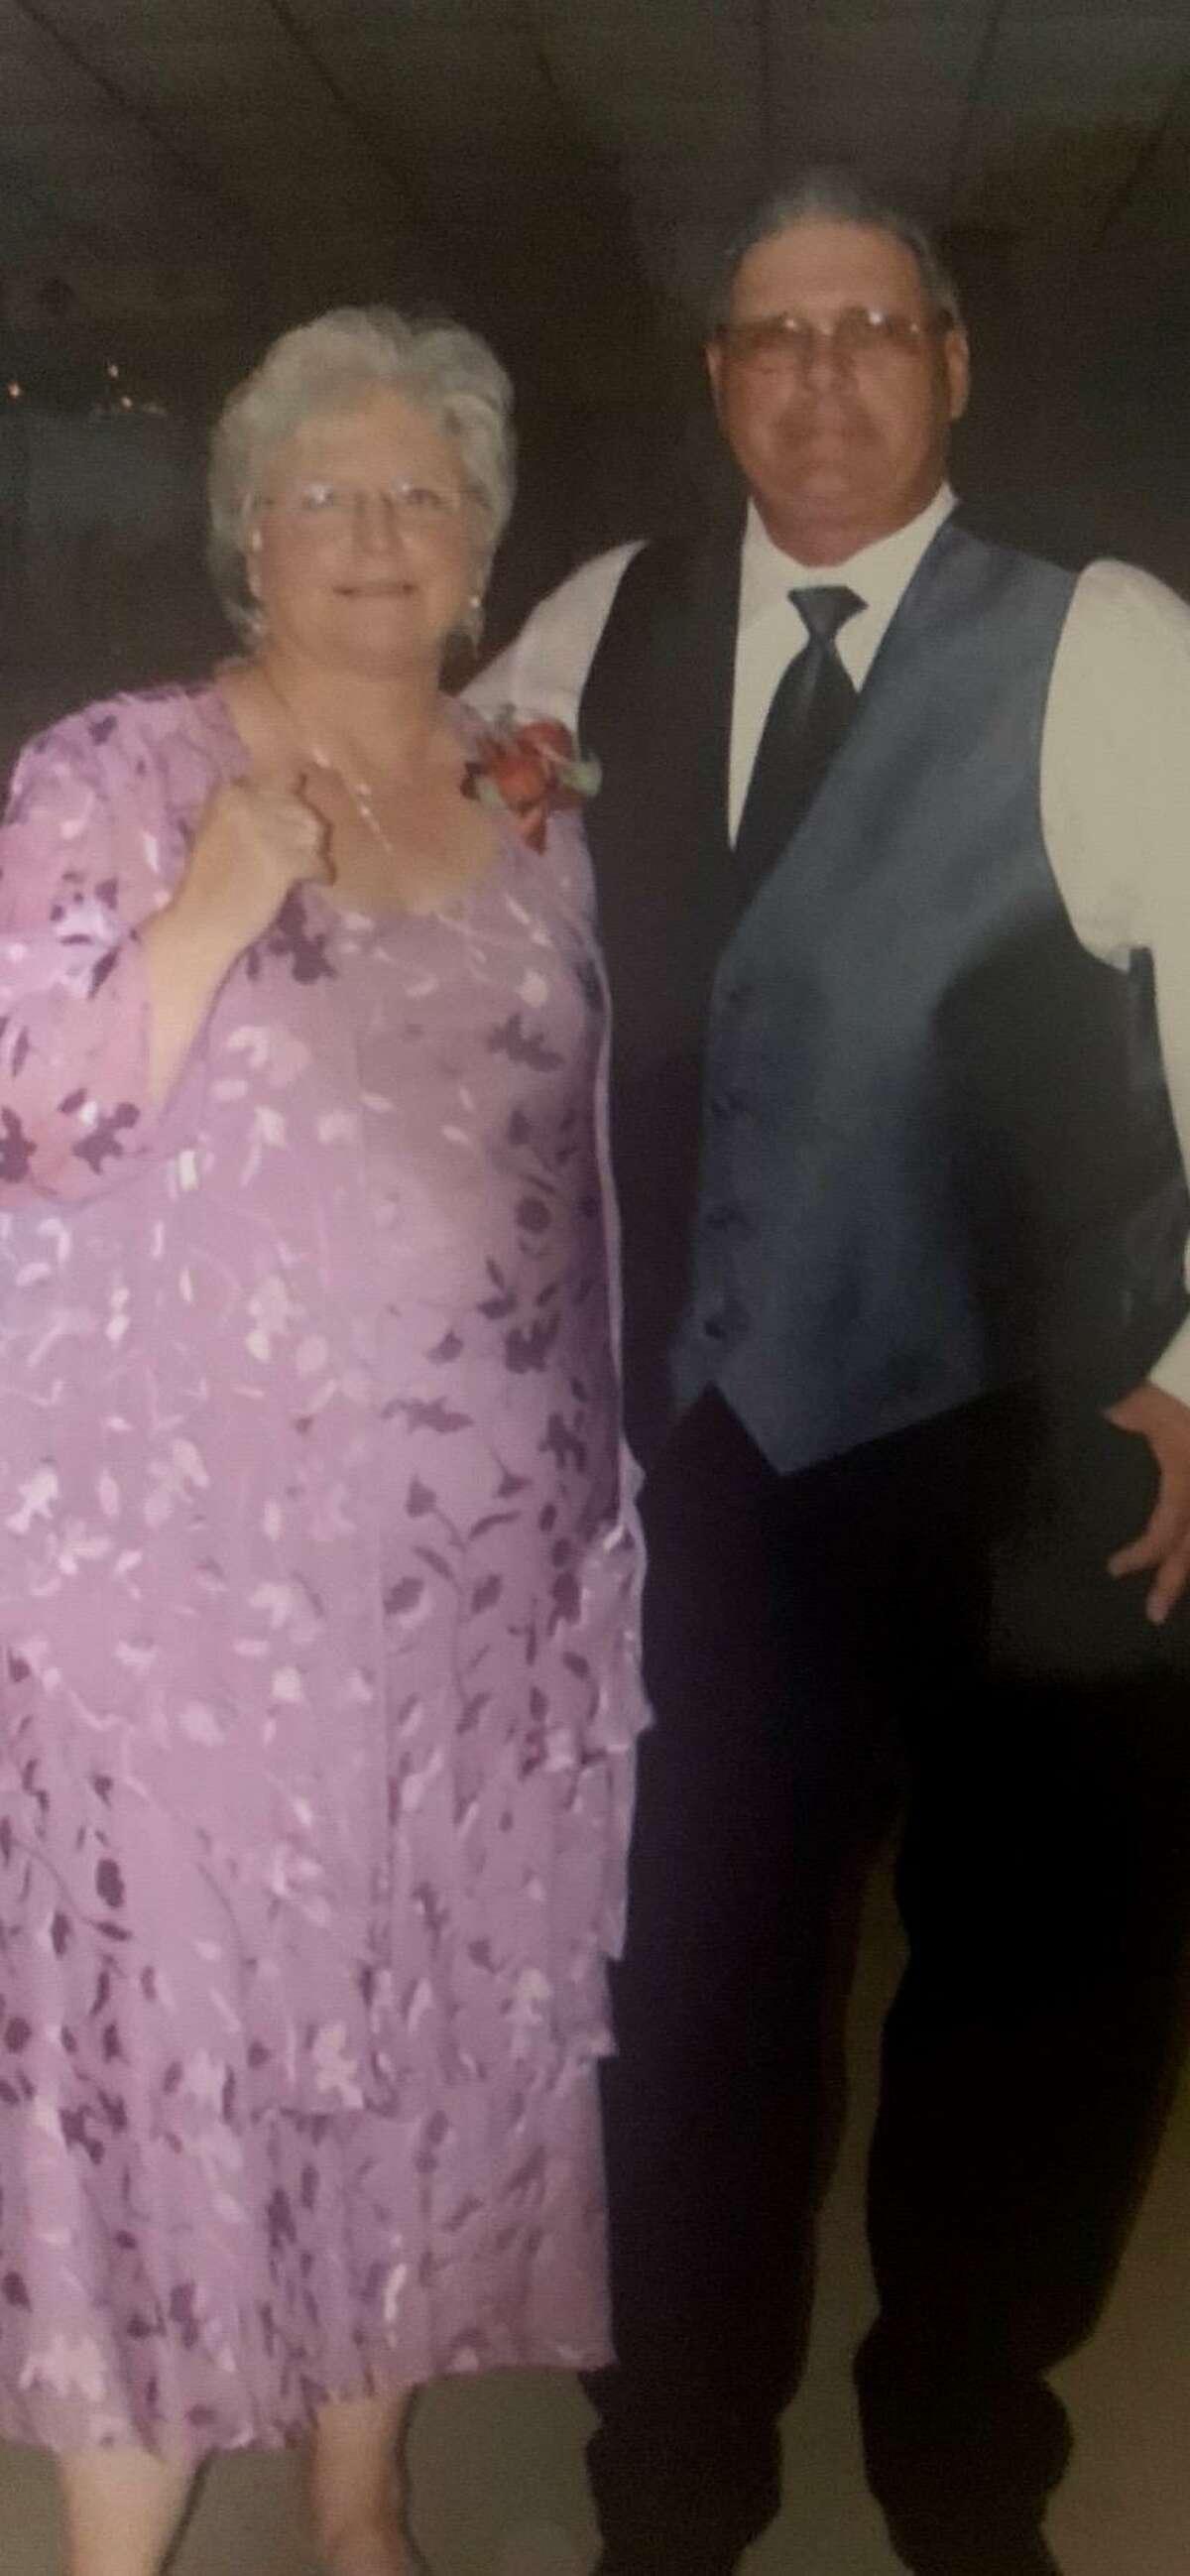 David and Loretta Runk